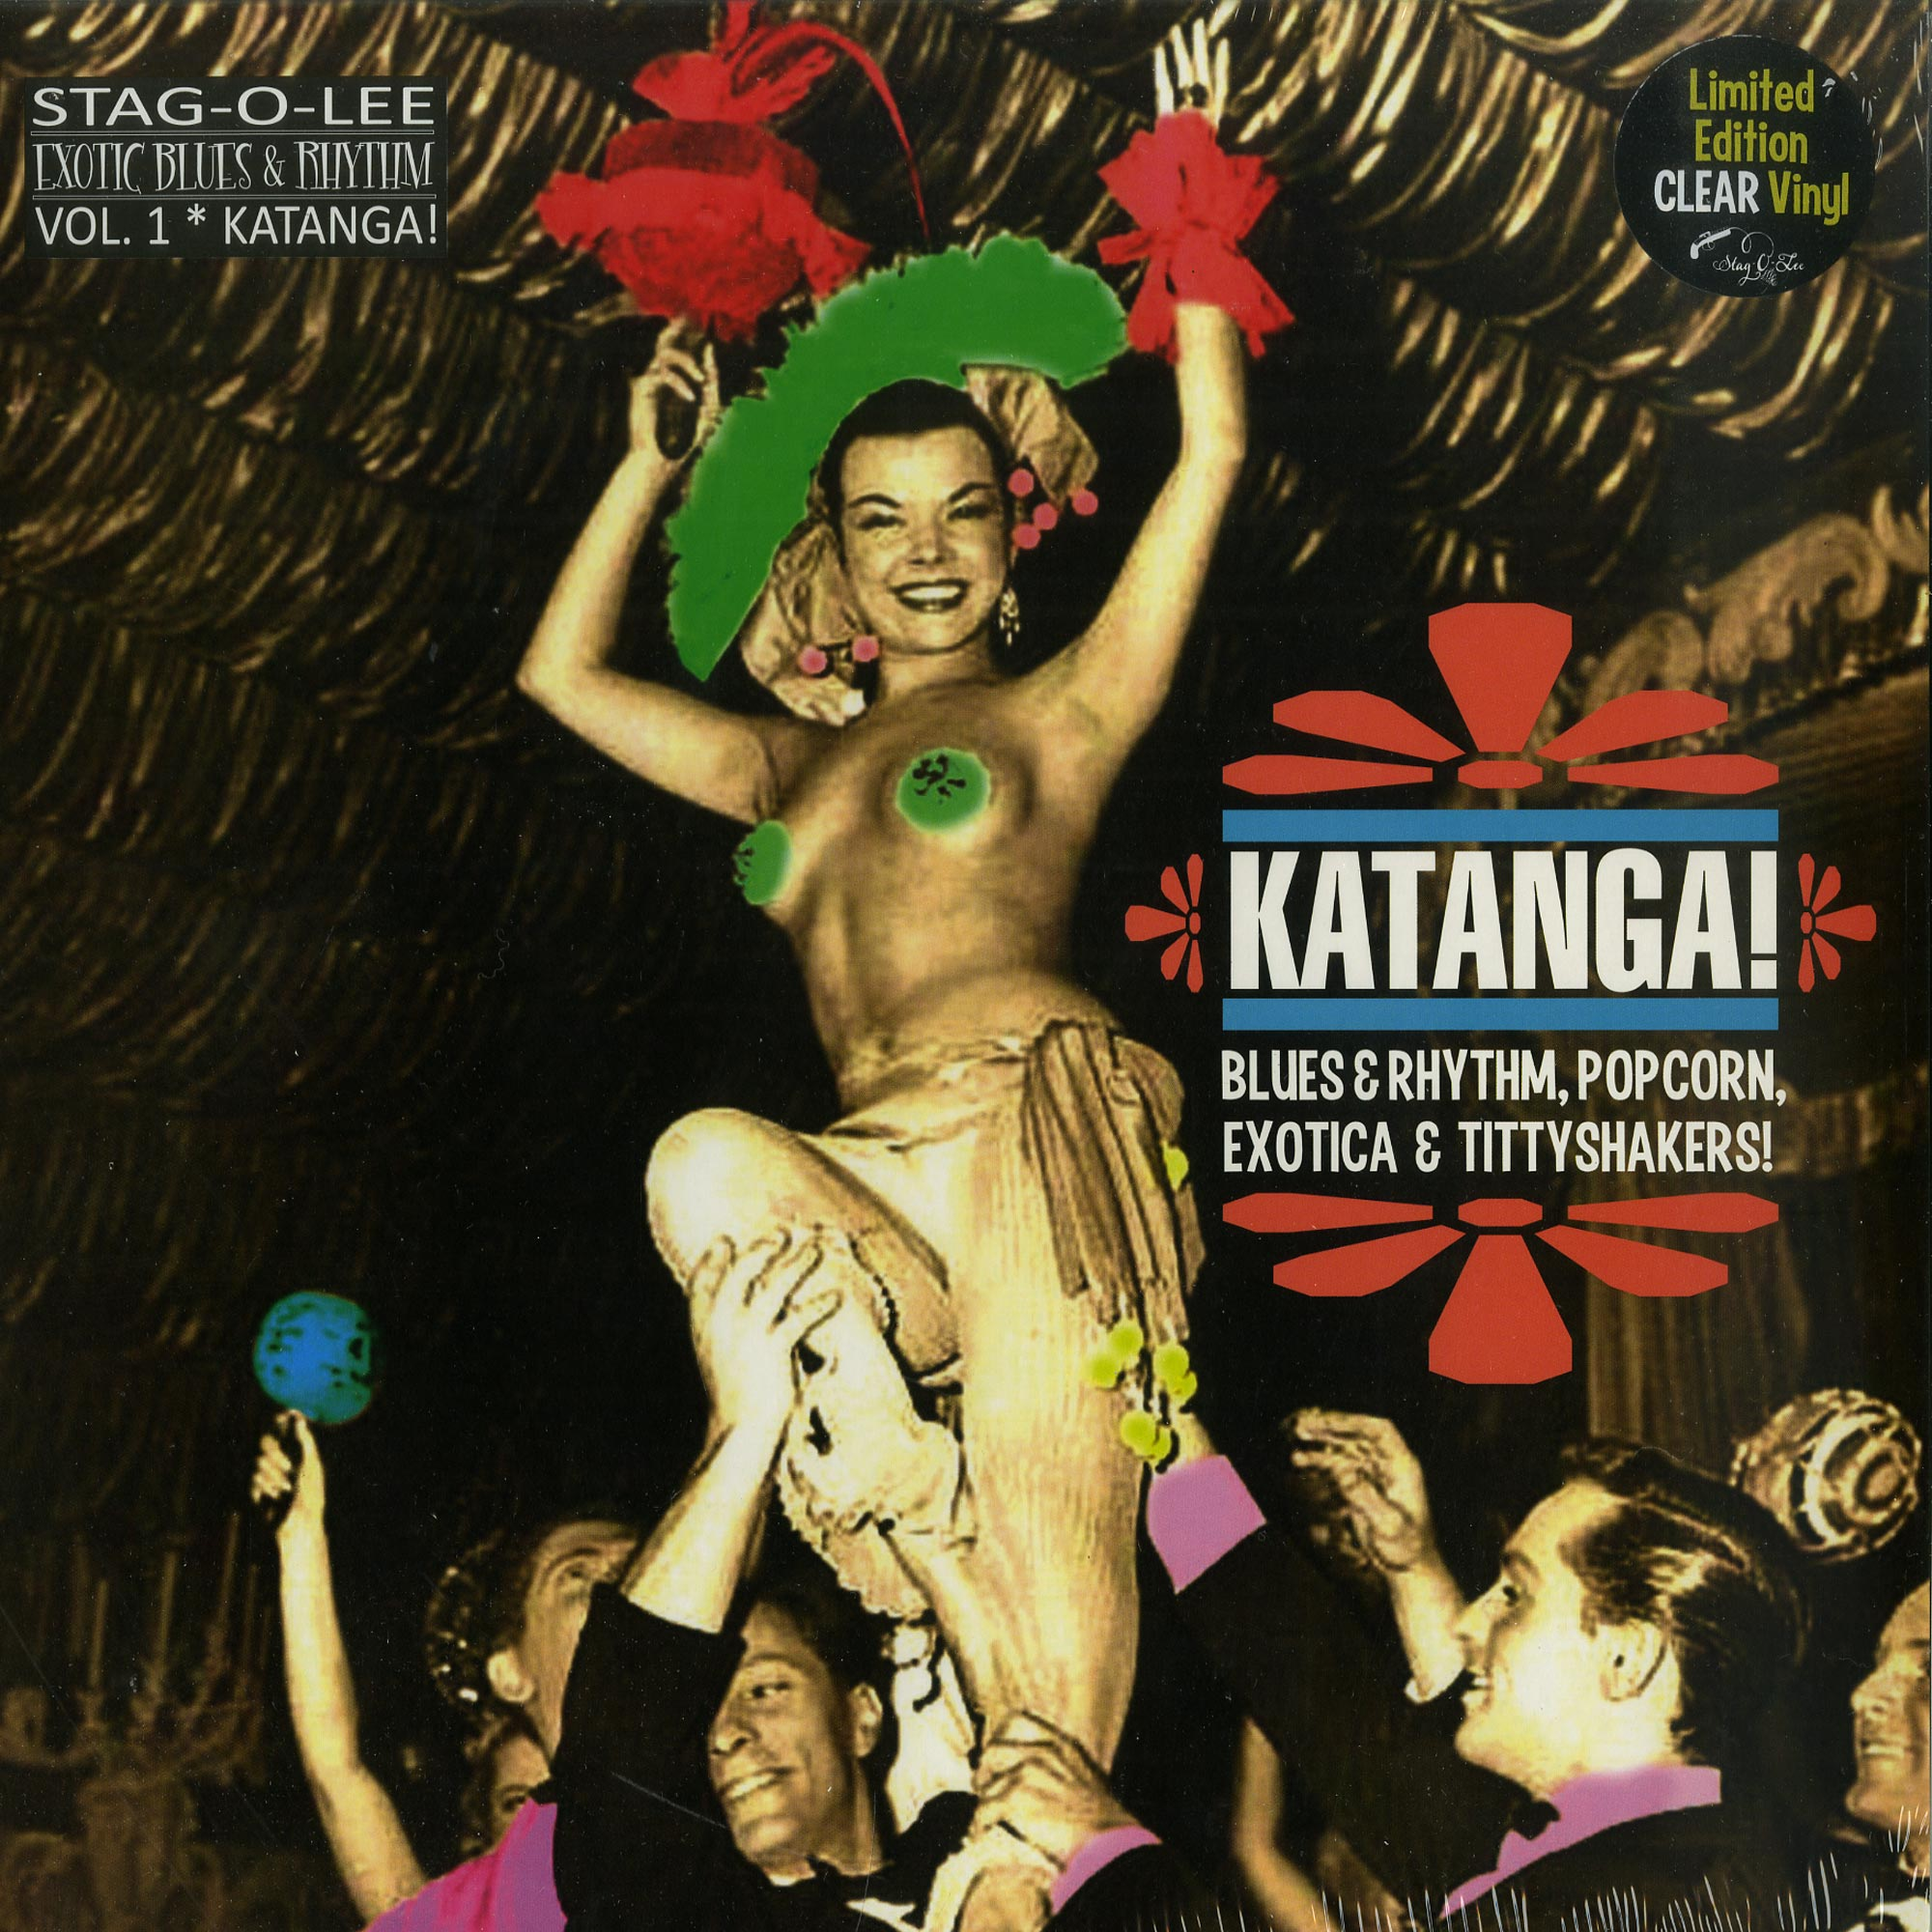 Various Artists - KATANGA! EXOTIC BLUES & RHYTHM VOL.1